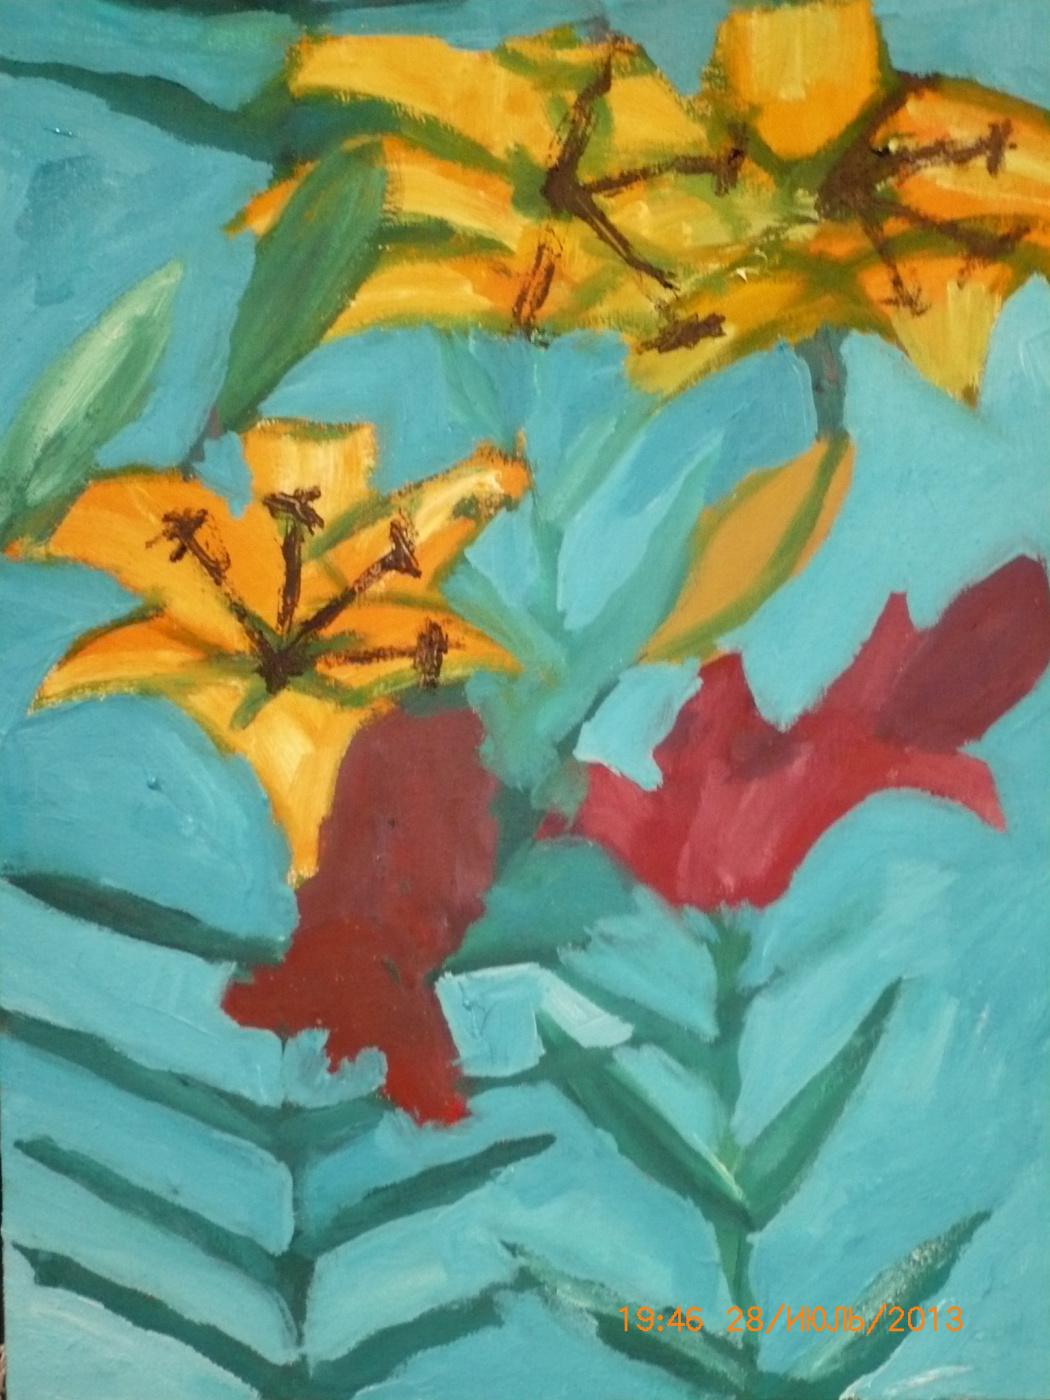 Alexander Victorovich Evgenyev. Sunny summer, oil on canvas, 2013, July